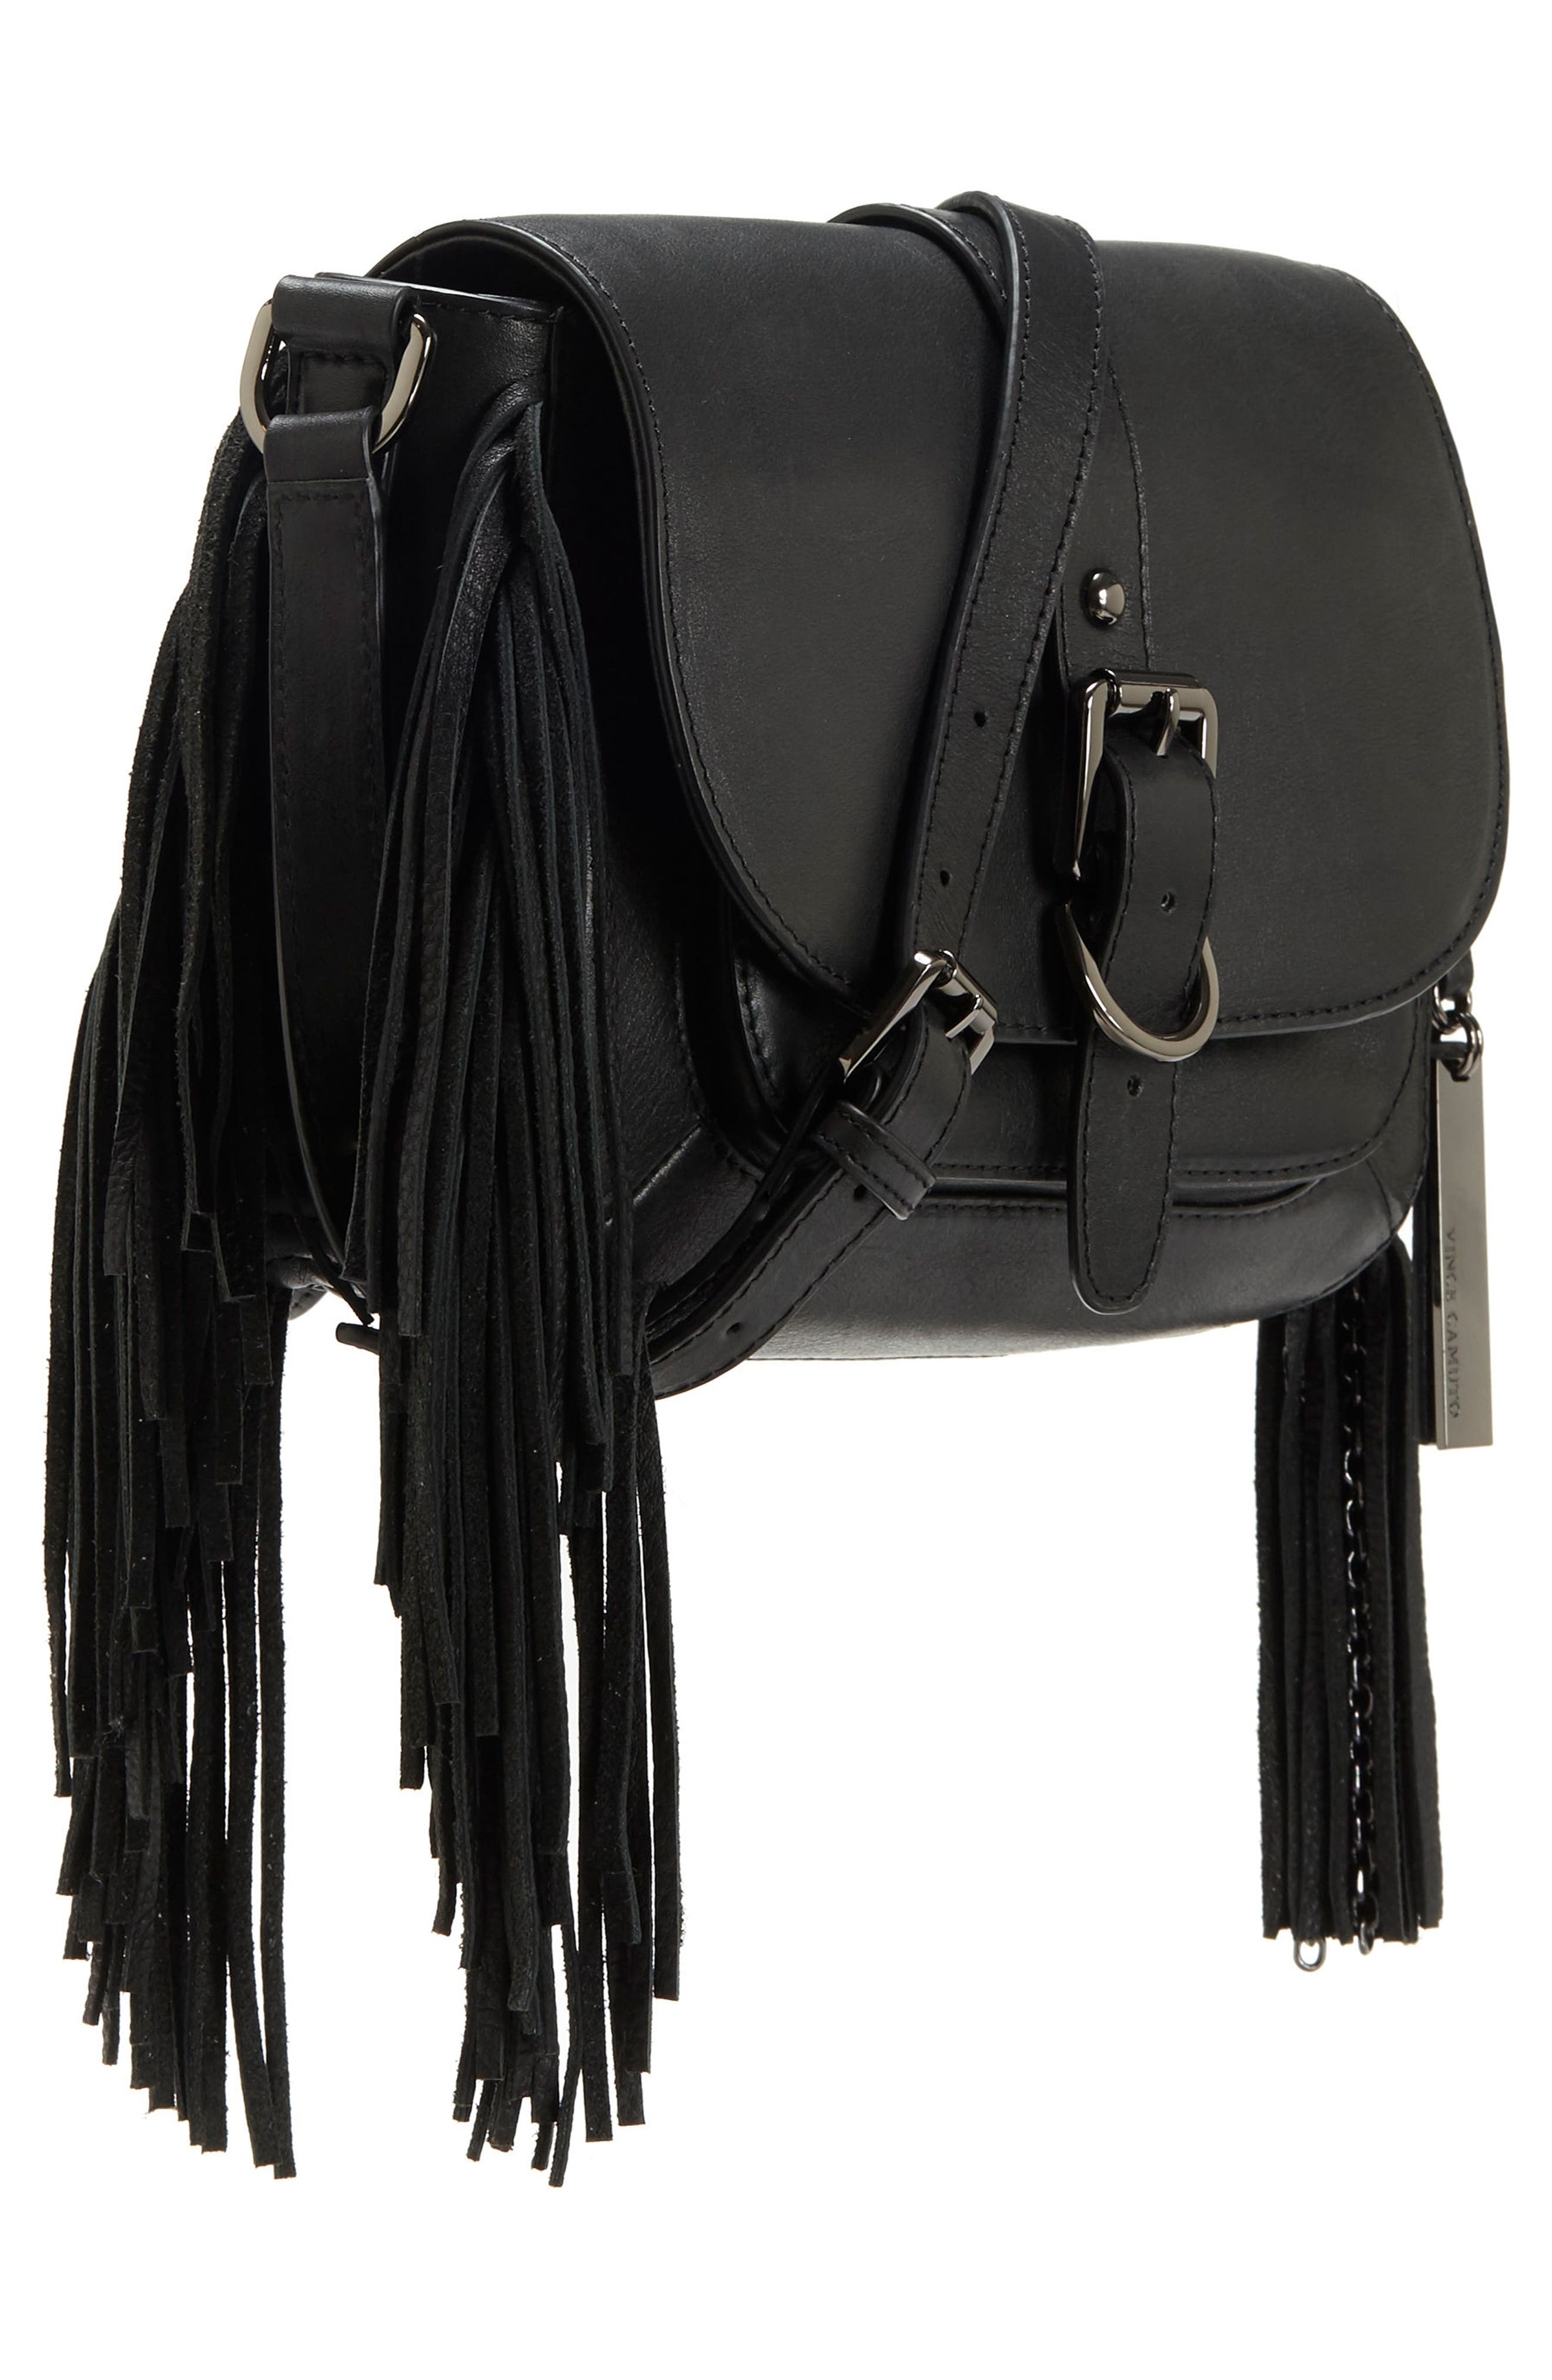 Hil Leather Crossbody Bag,                             Alternate thumbnail 5, color,                             002